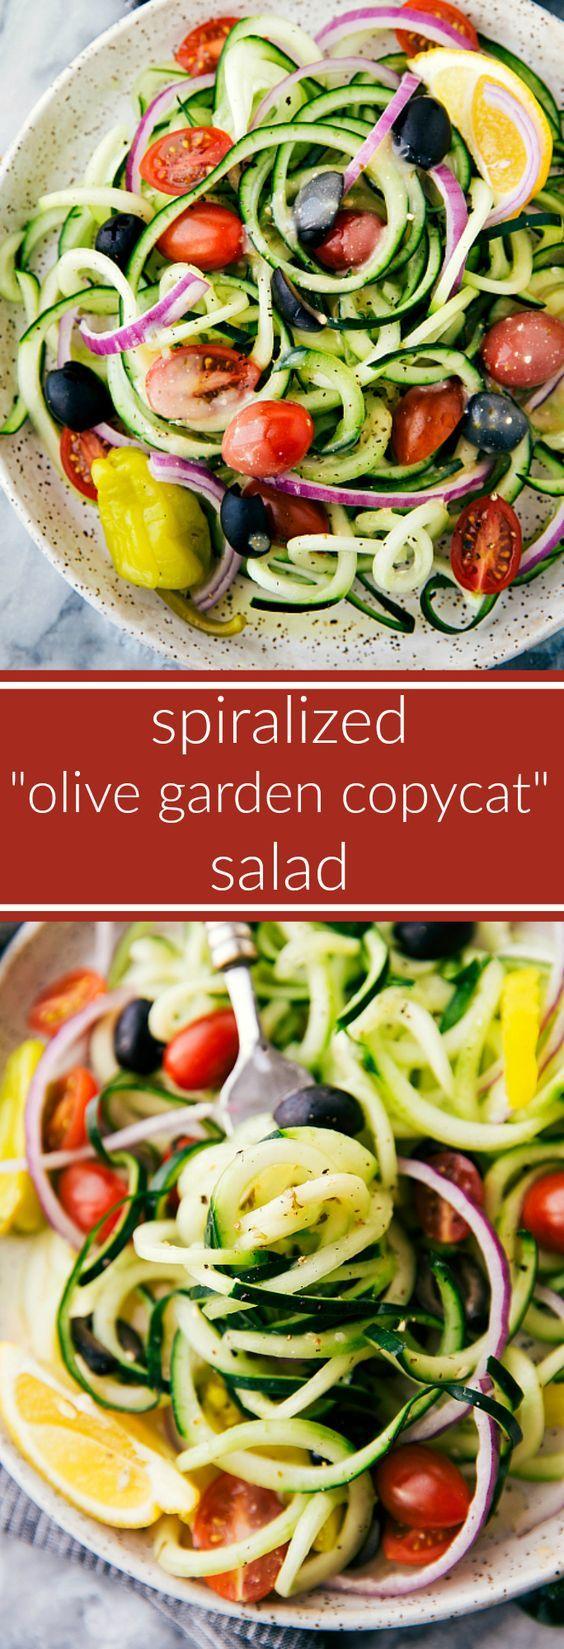 A super simple cucumber salad with spiralized cucumbers